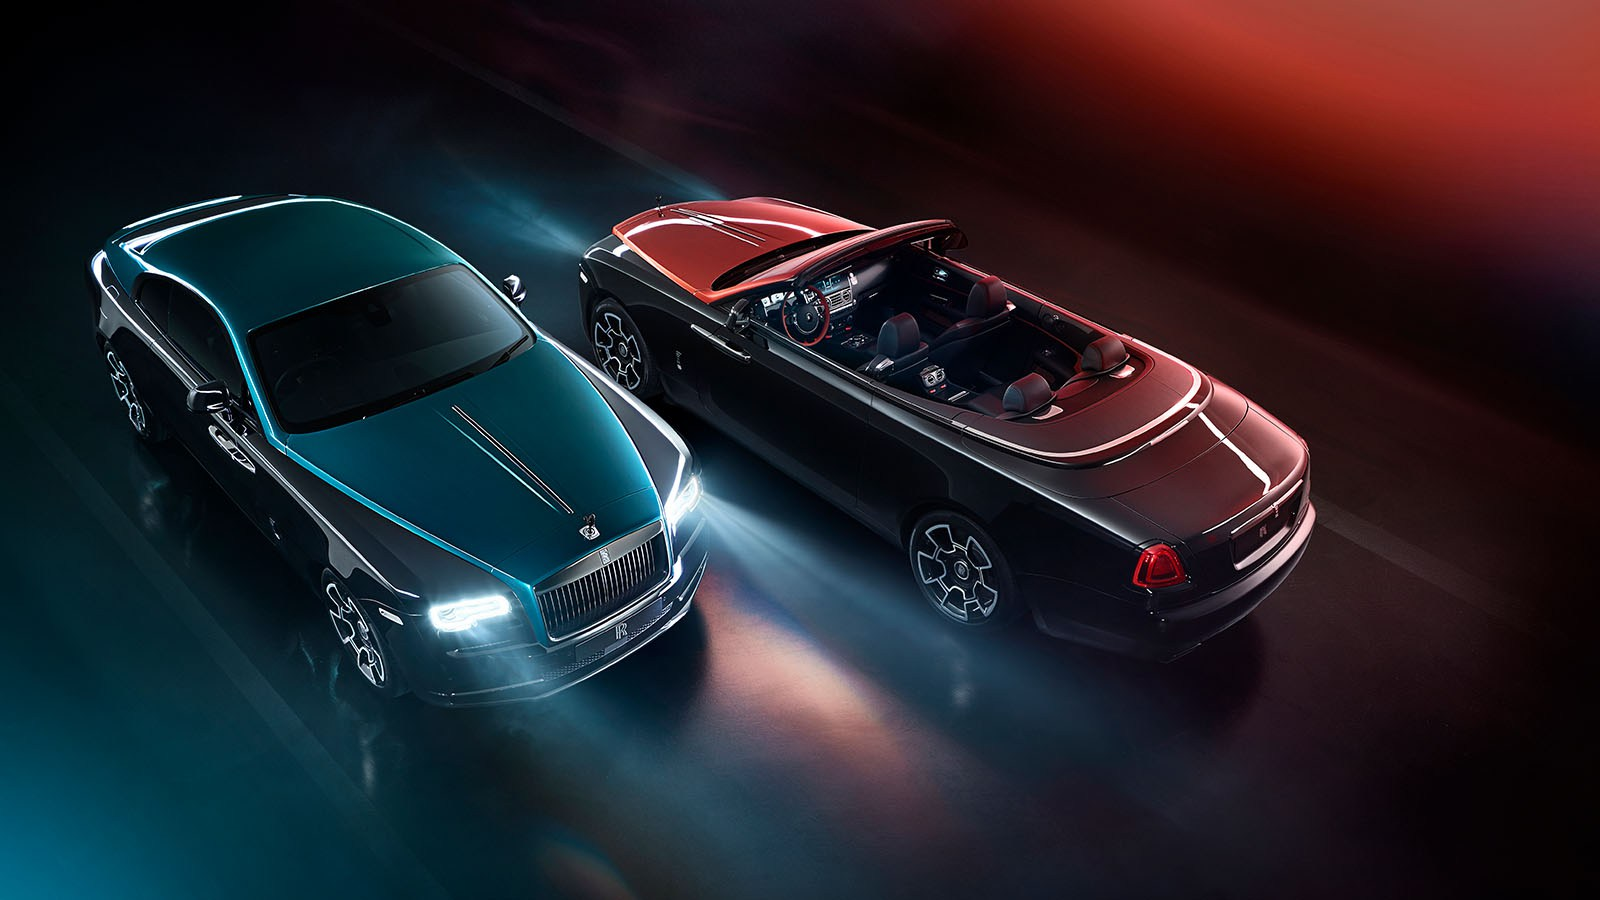 Rolls-Royce Presents Adamas Collection with Carbon-fiber Spirit of Ecstasy